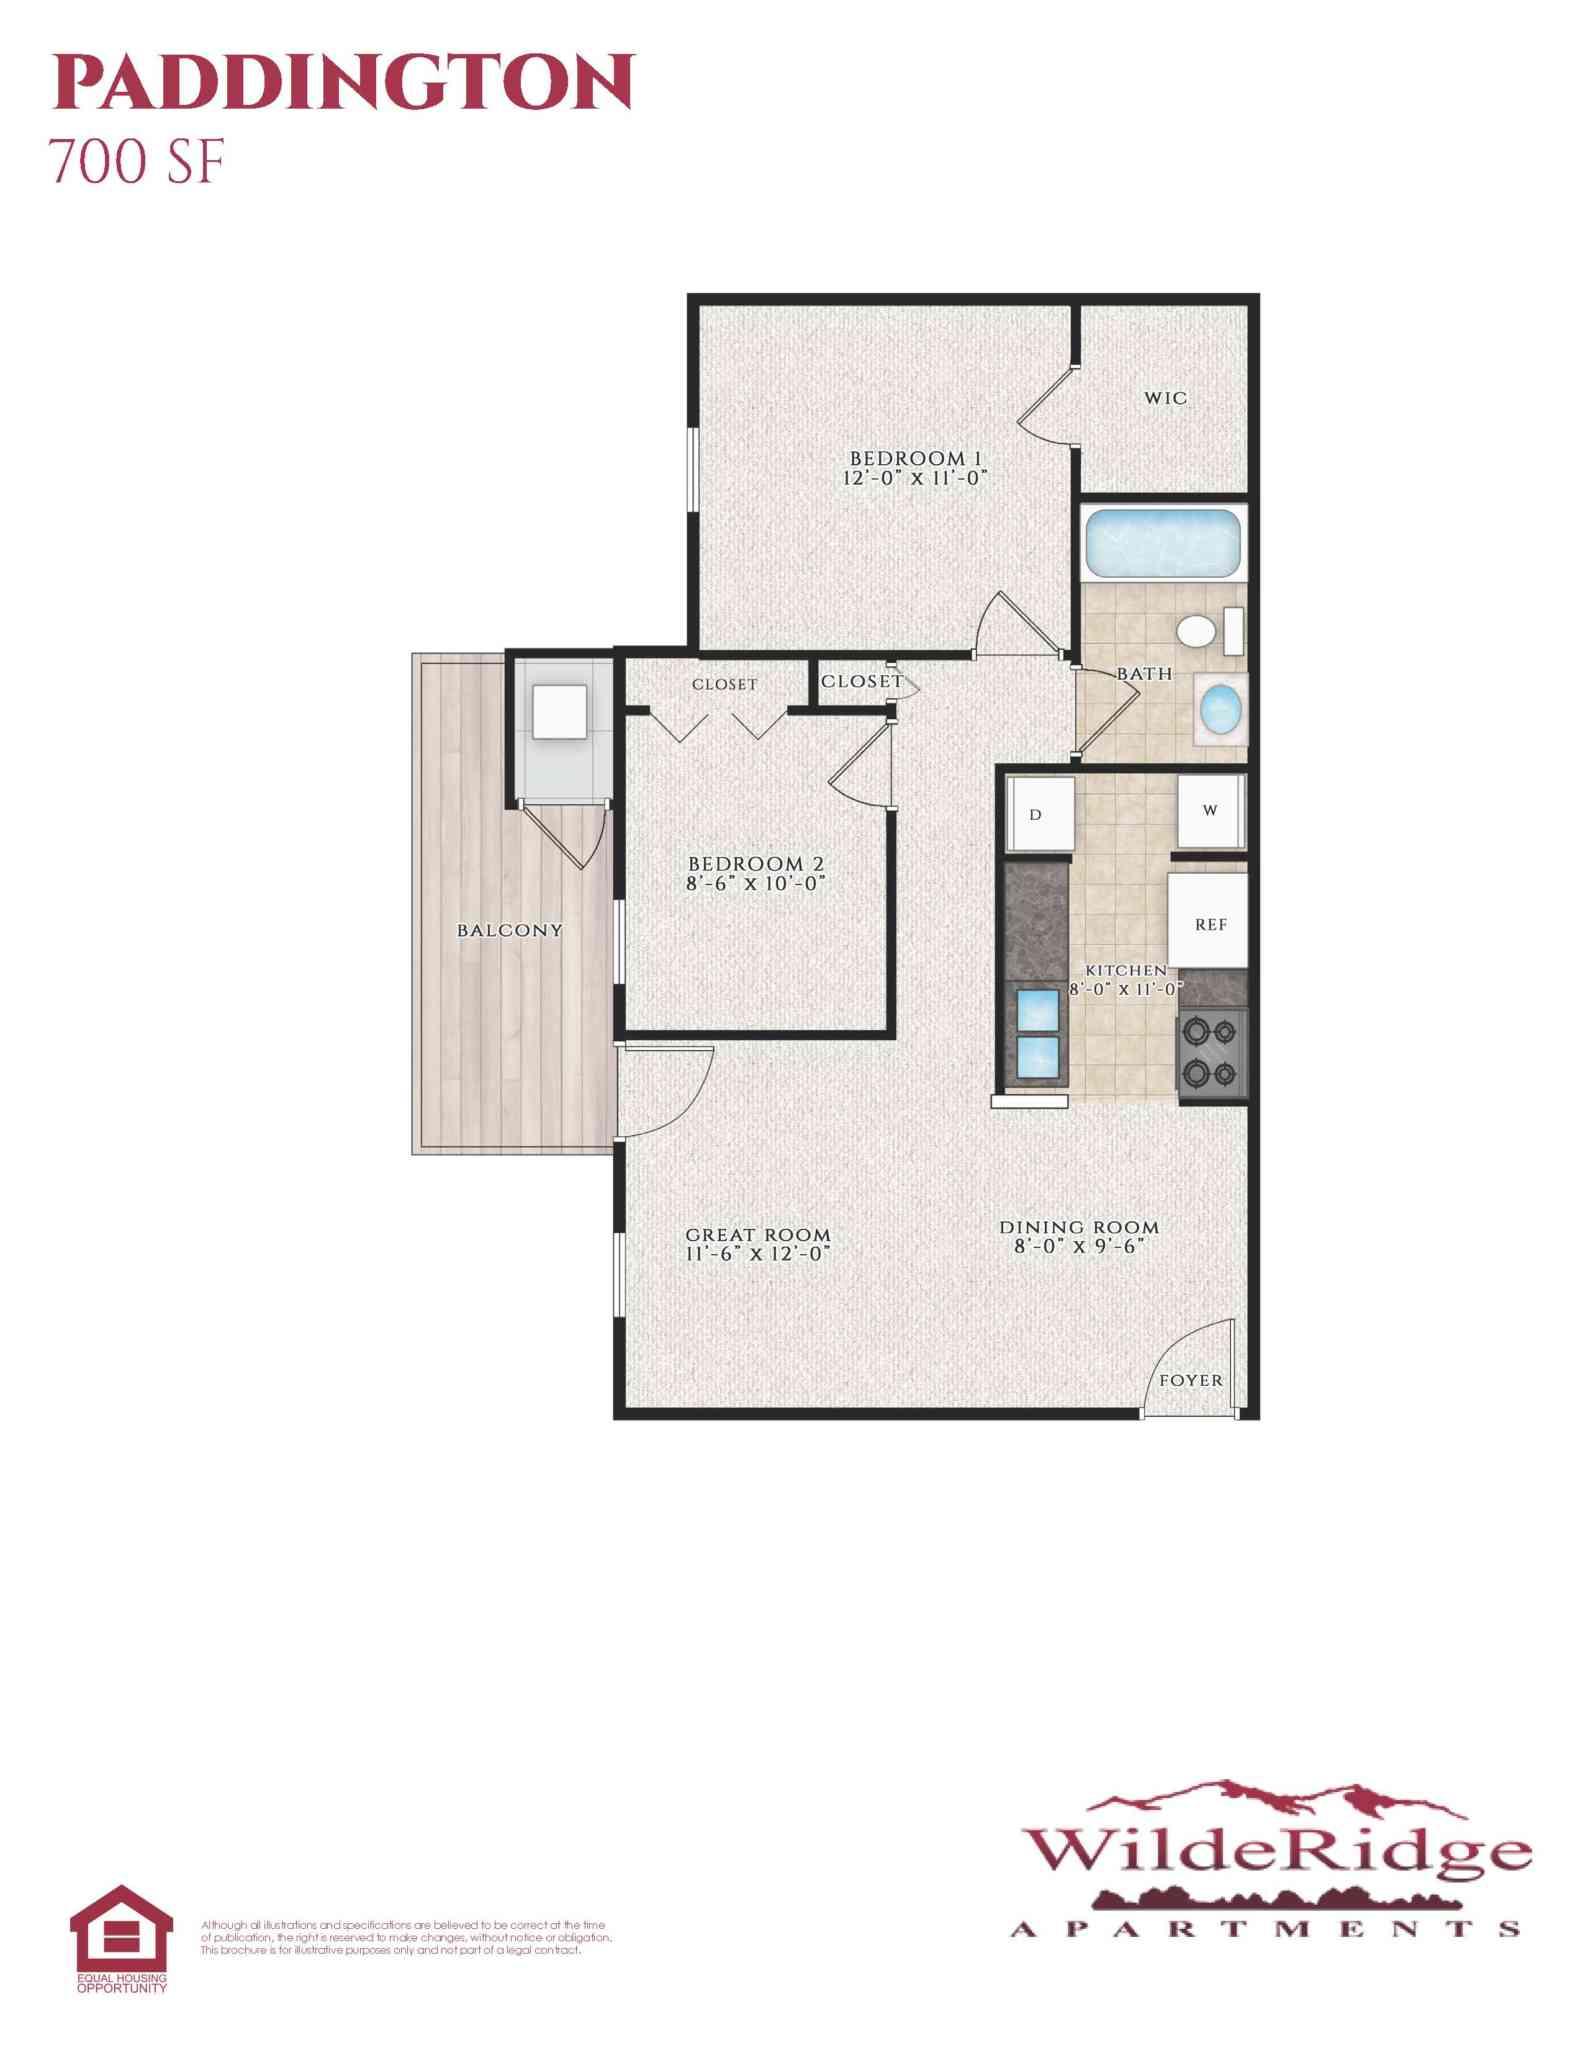 The Paddington Floor Plan